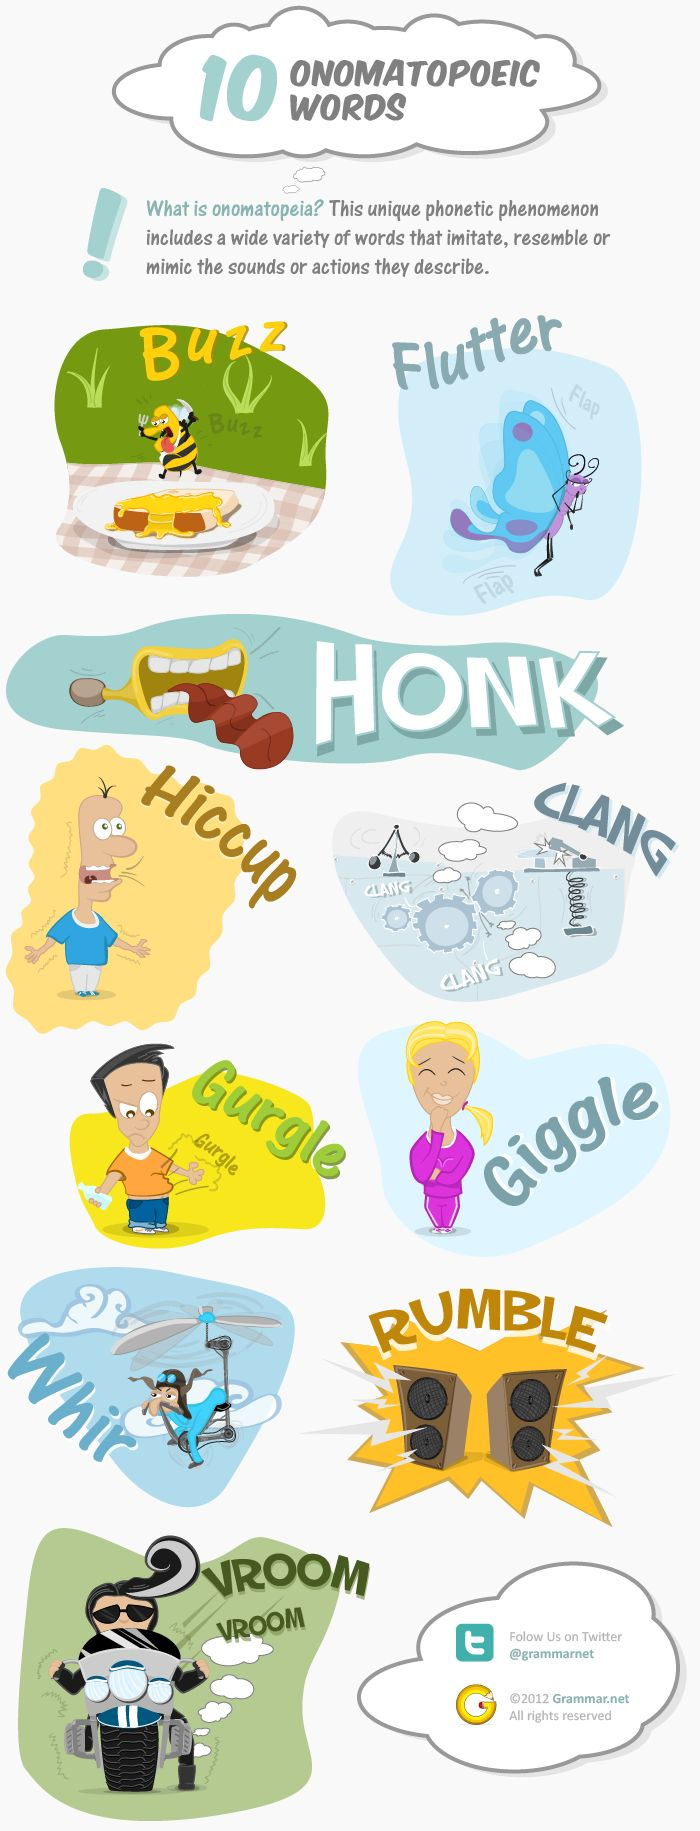 Aprende inglés: 10 onomatopeyas #infografia #infographic #education